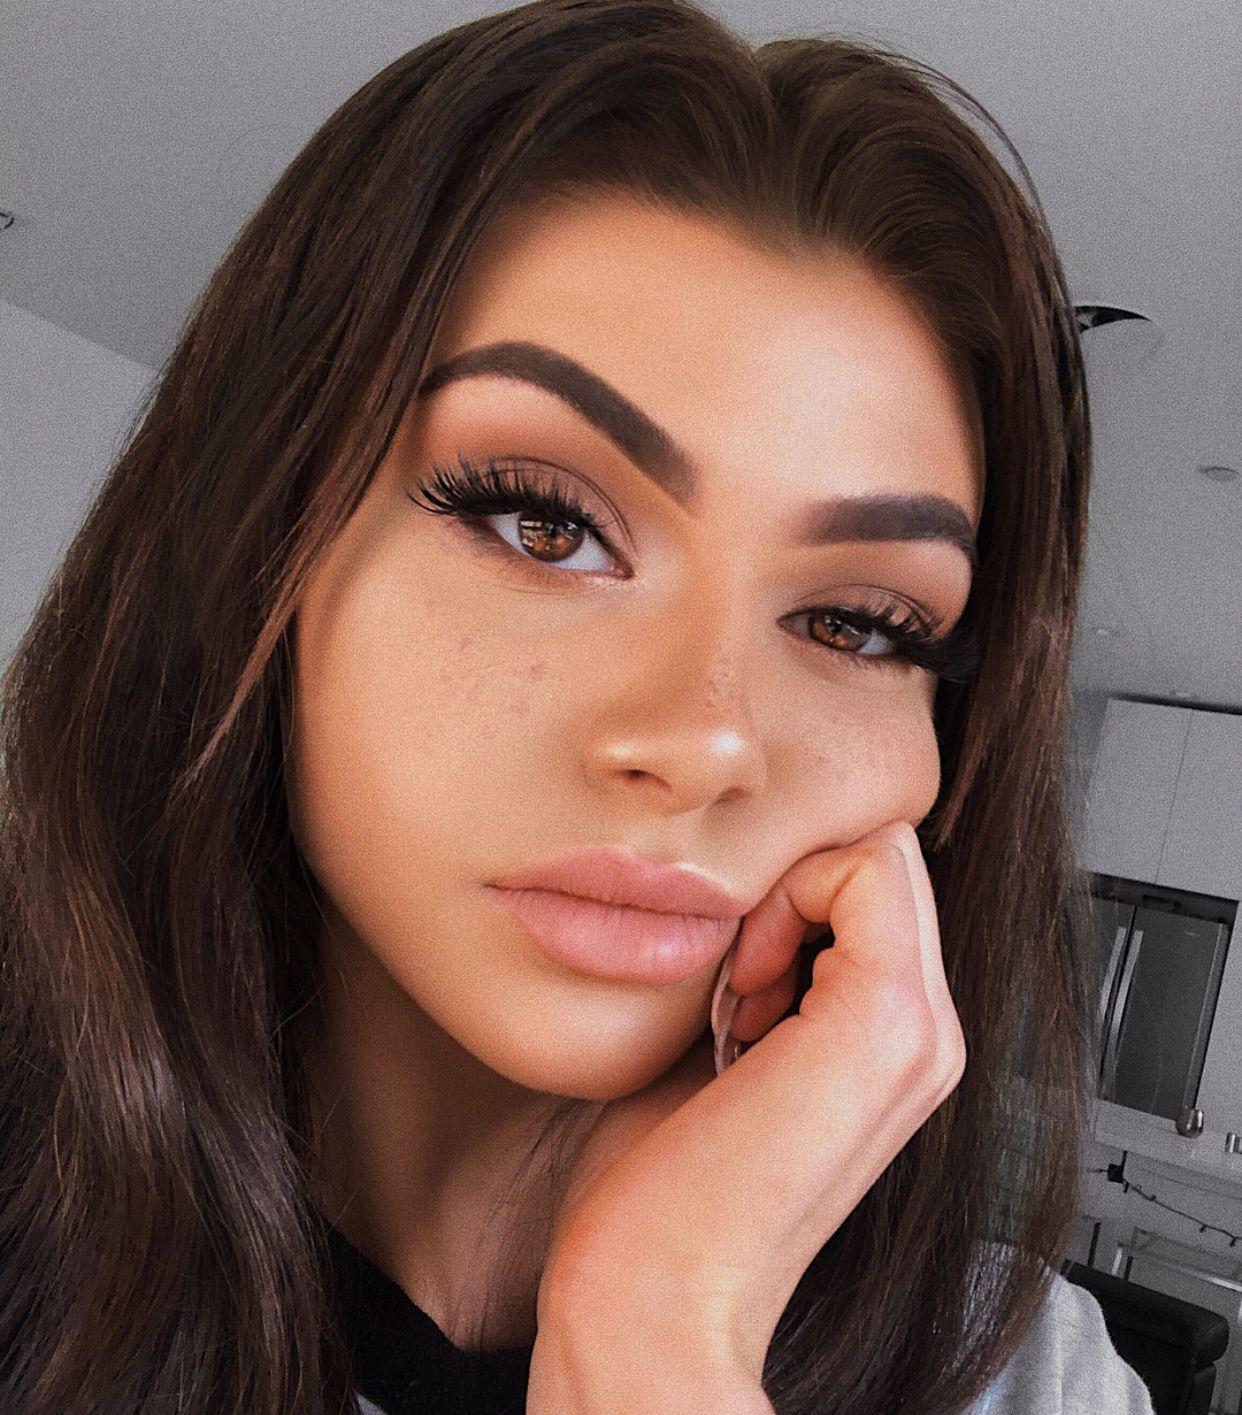 Pinterest: Bella_DeLeon  Day makeup, Valentines day makeup